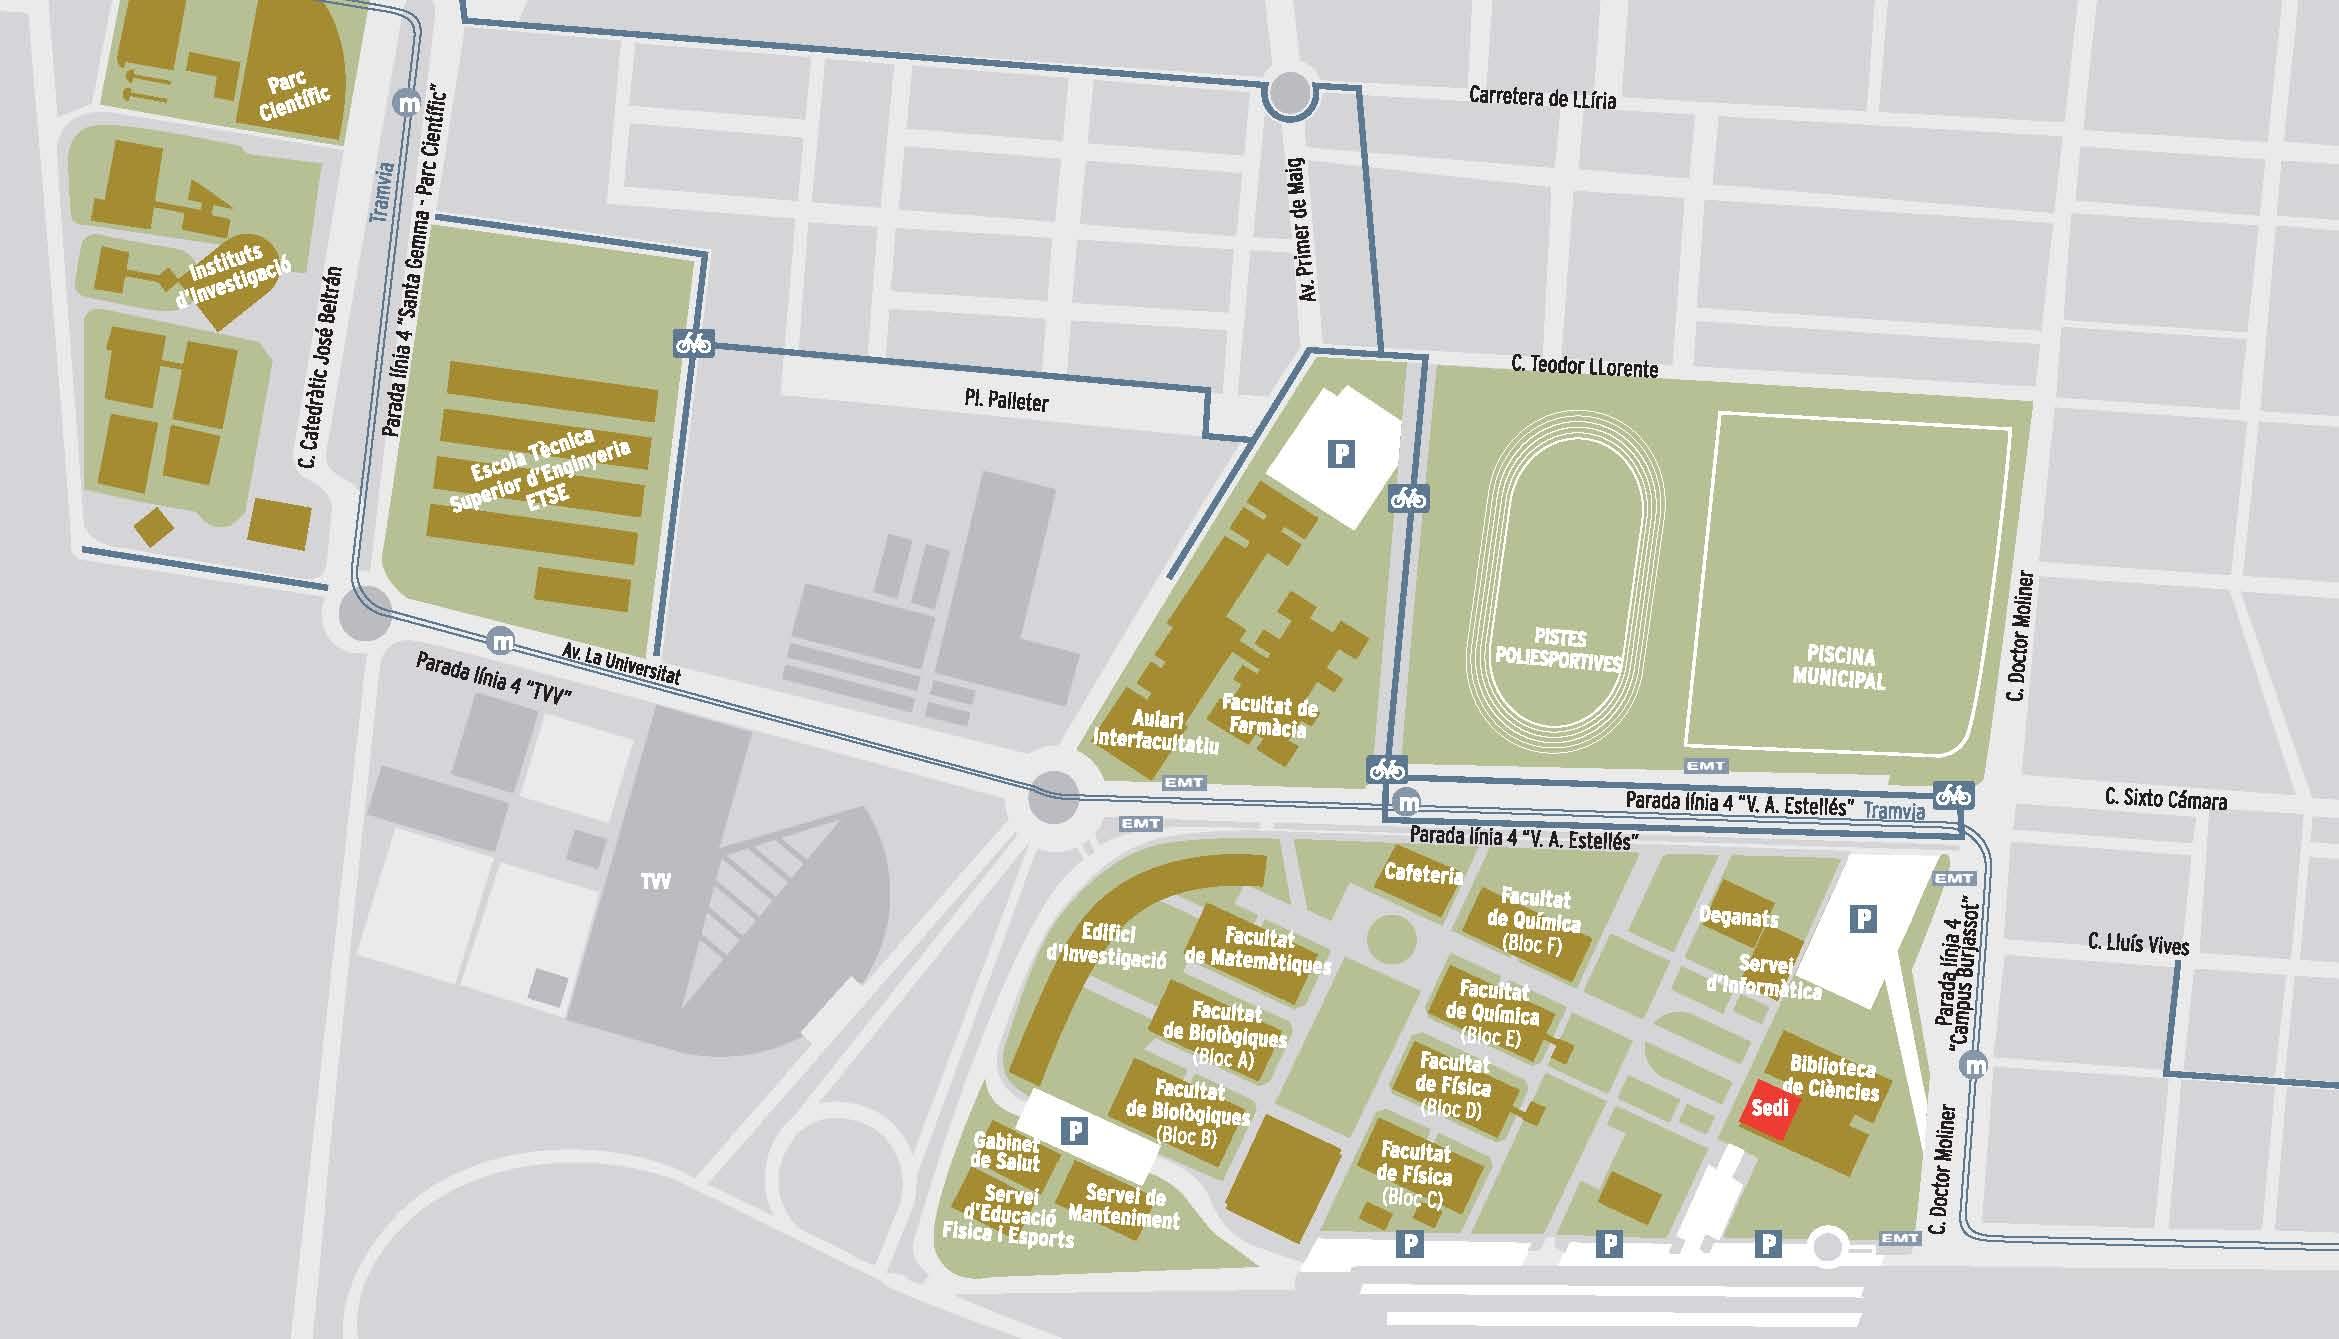 Toyota Of Plano >> Campus de Burjassot-Paterna